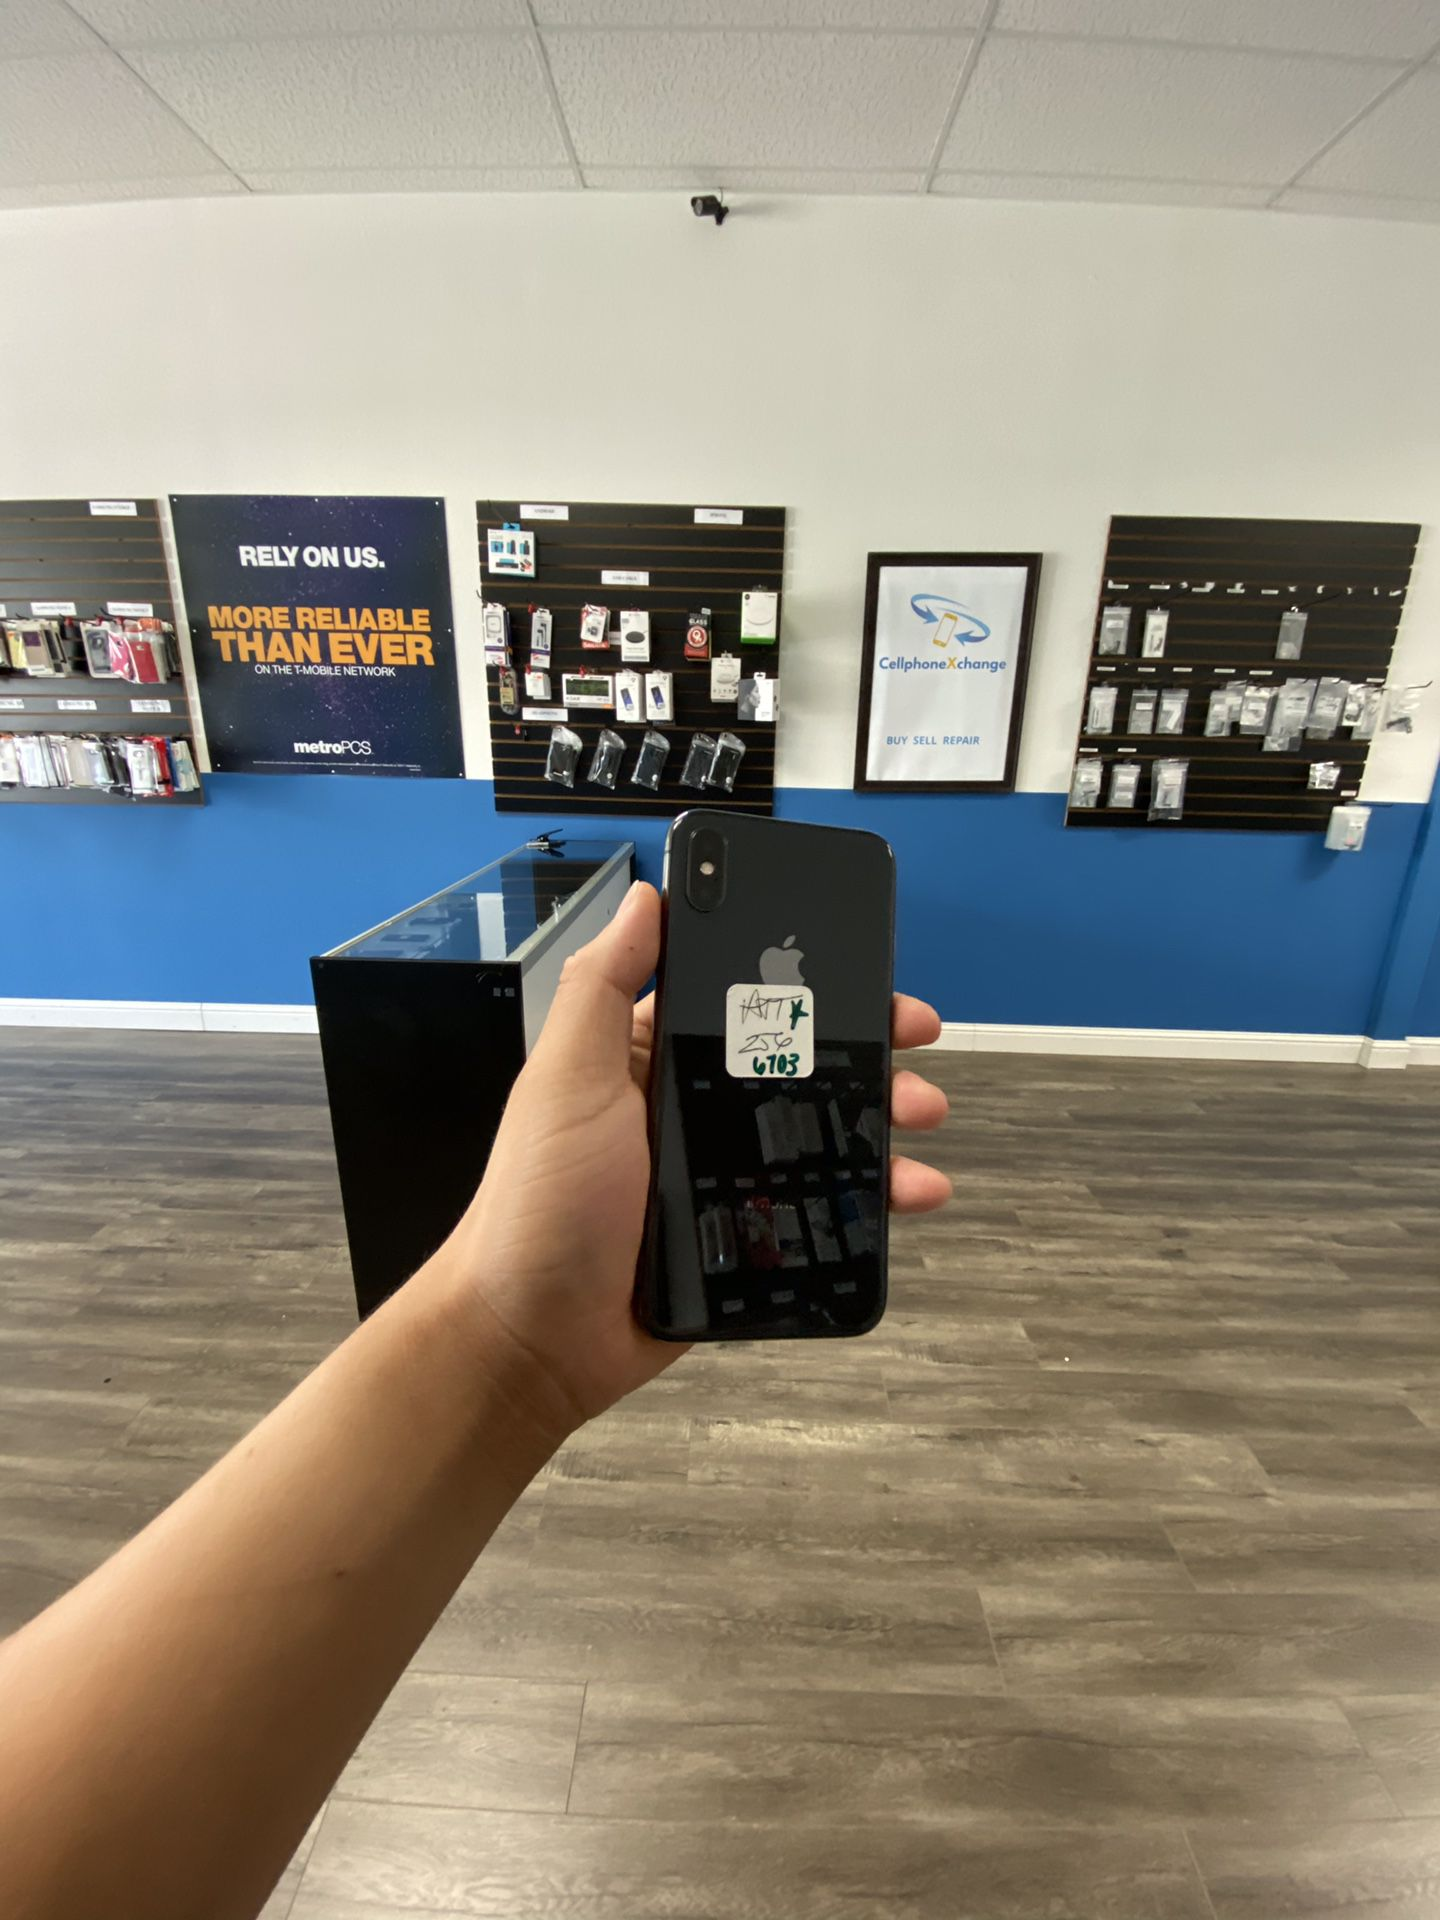 IPHONE X 256GB AT&T CRICKET